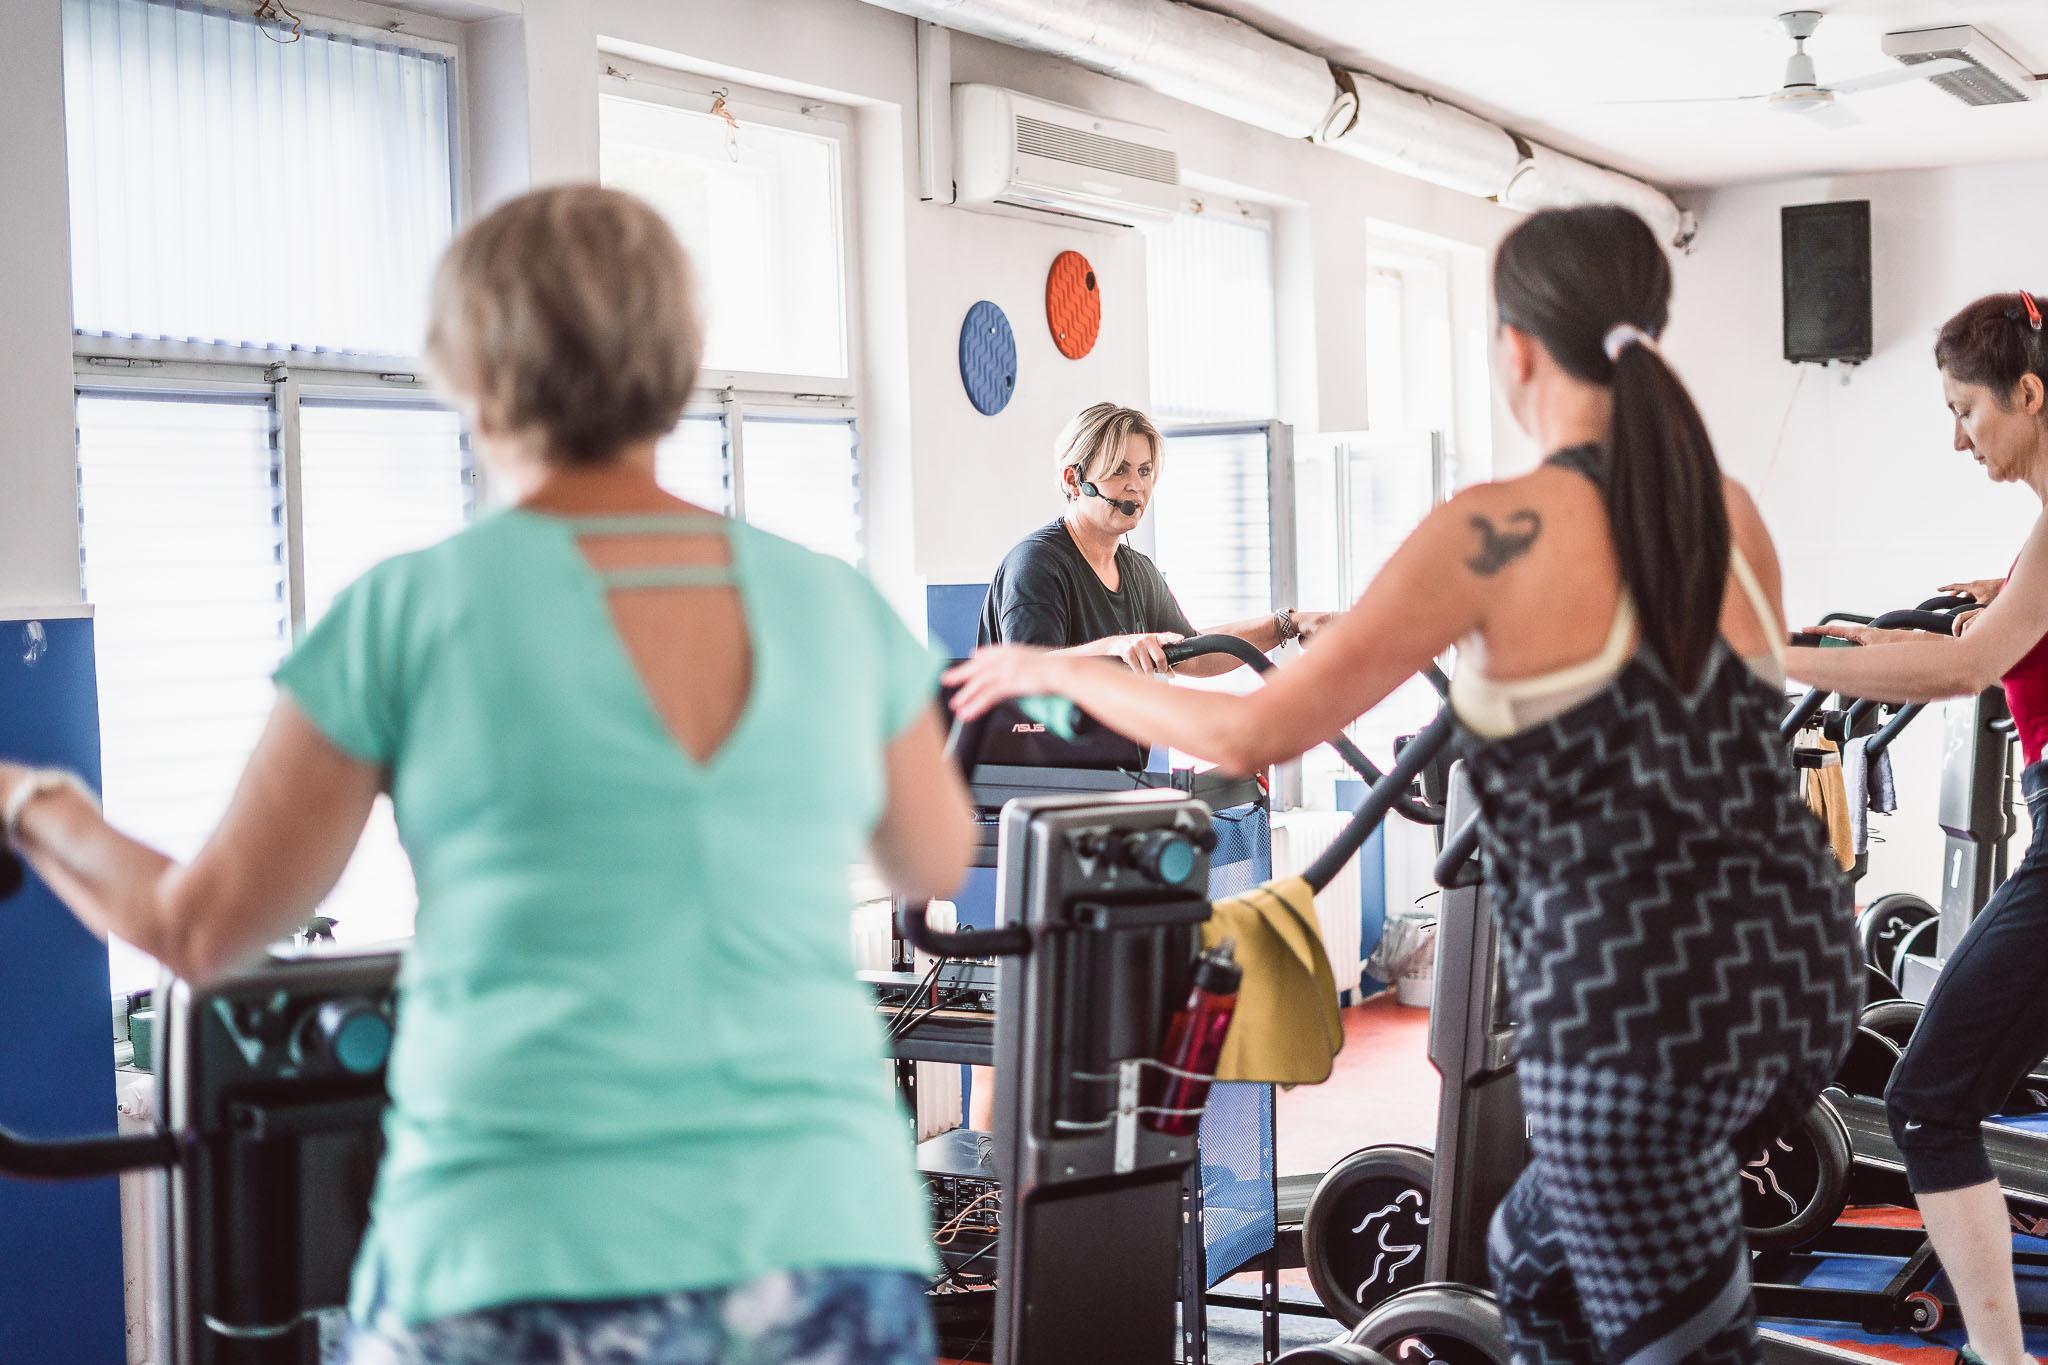 heat lekce teplice next studio fitness centrum